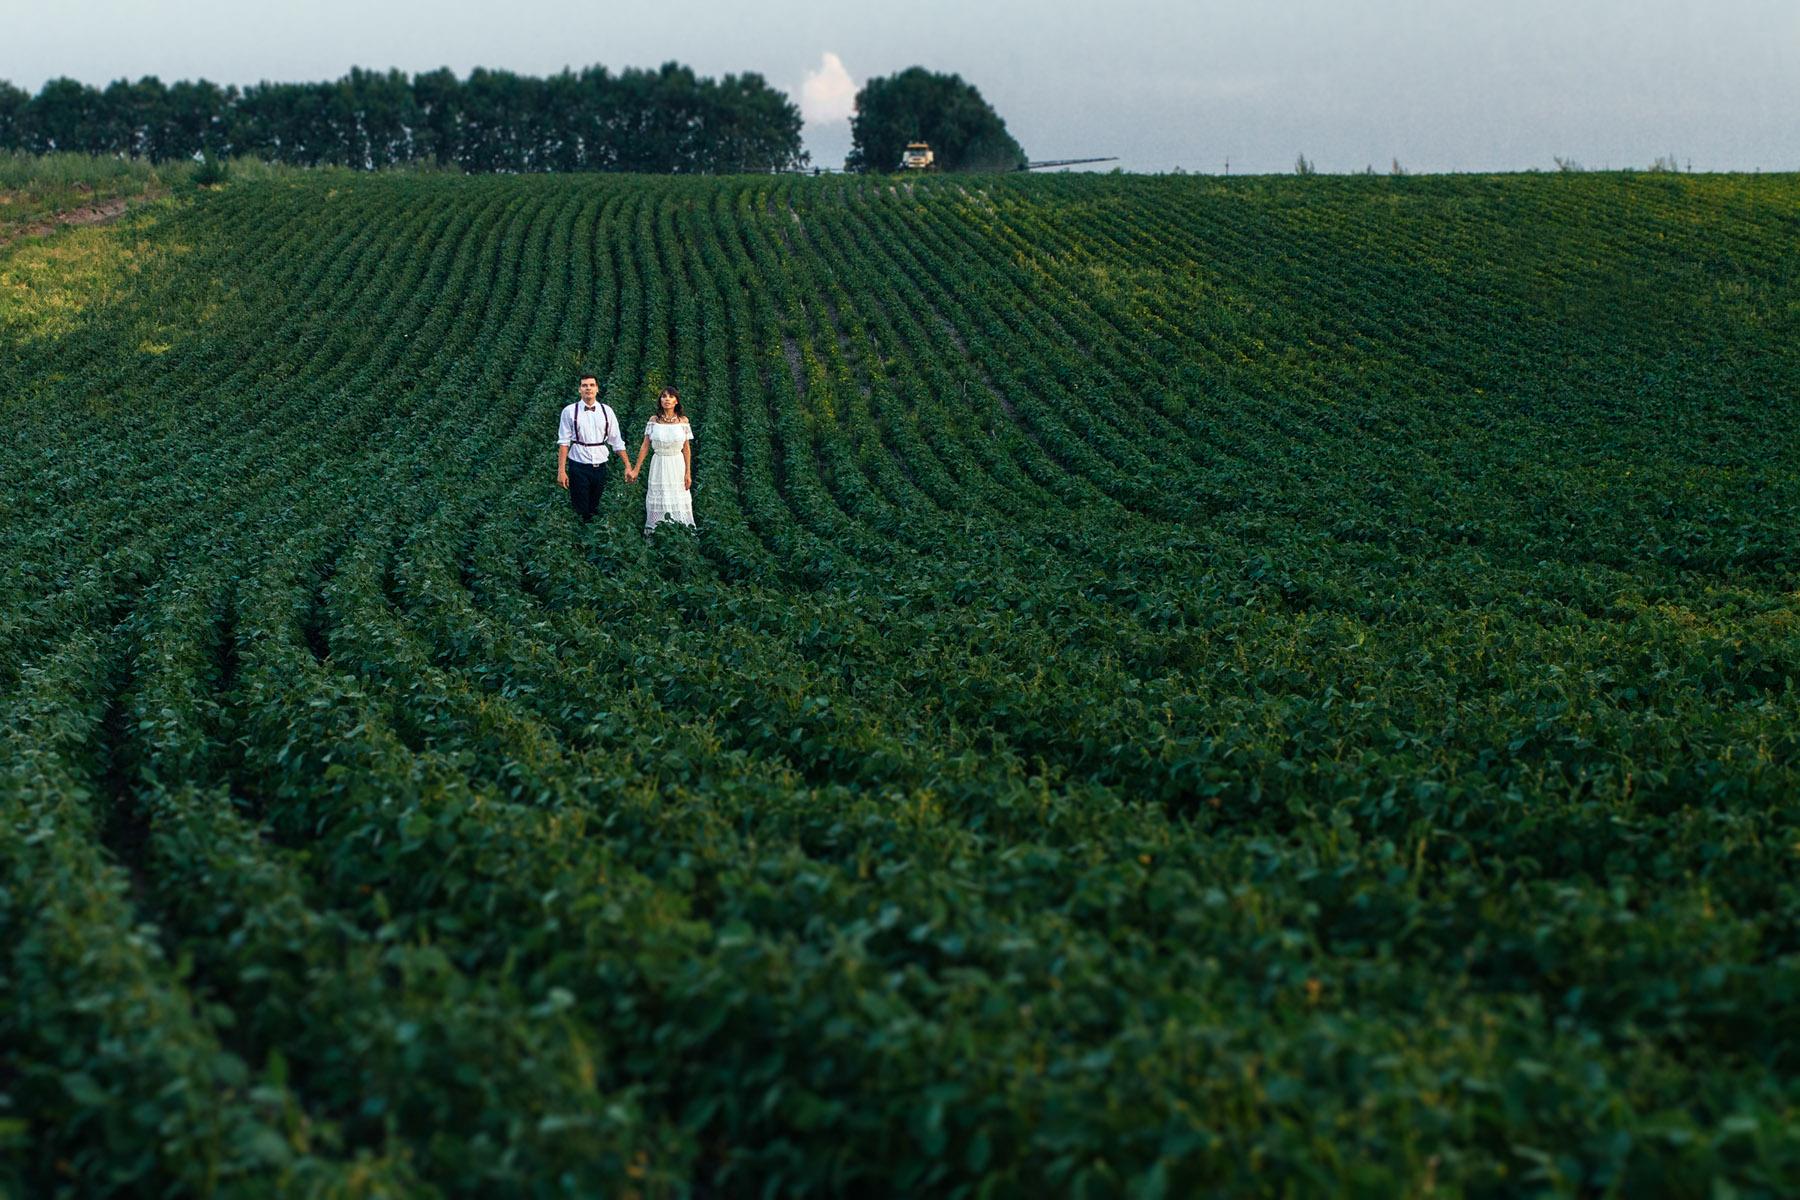 муж и жена в поле